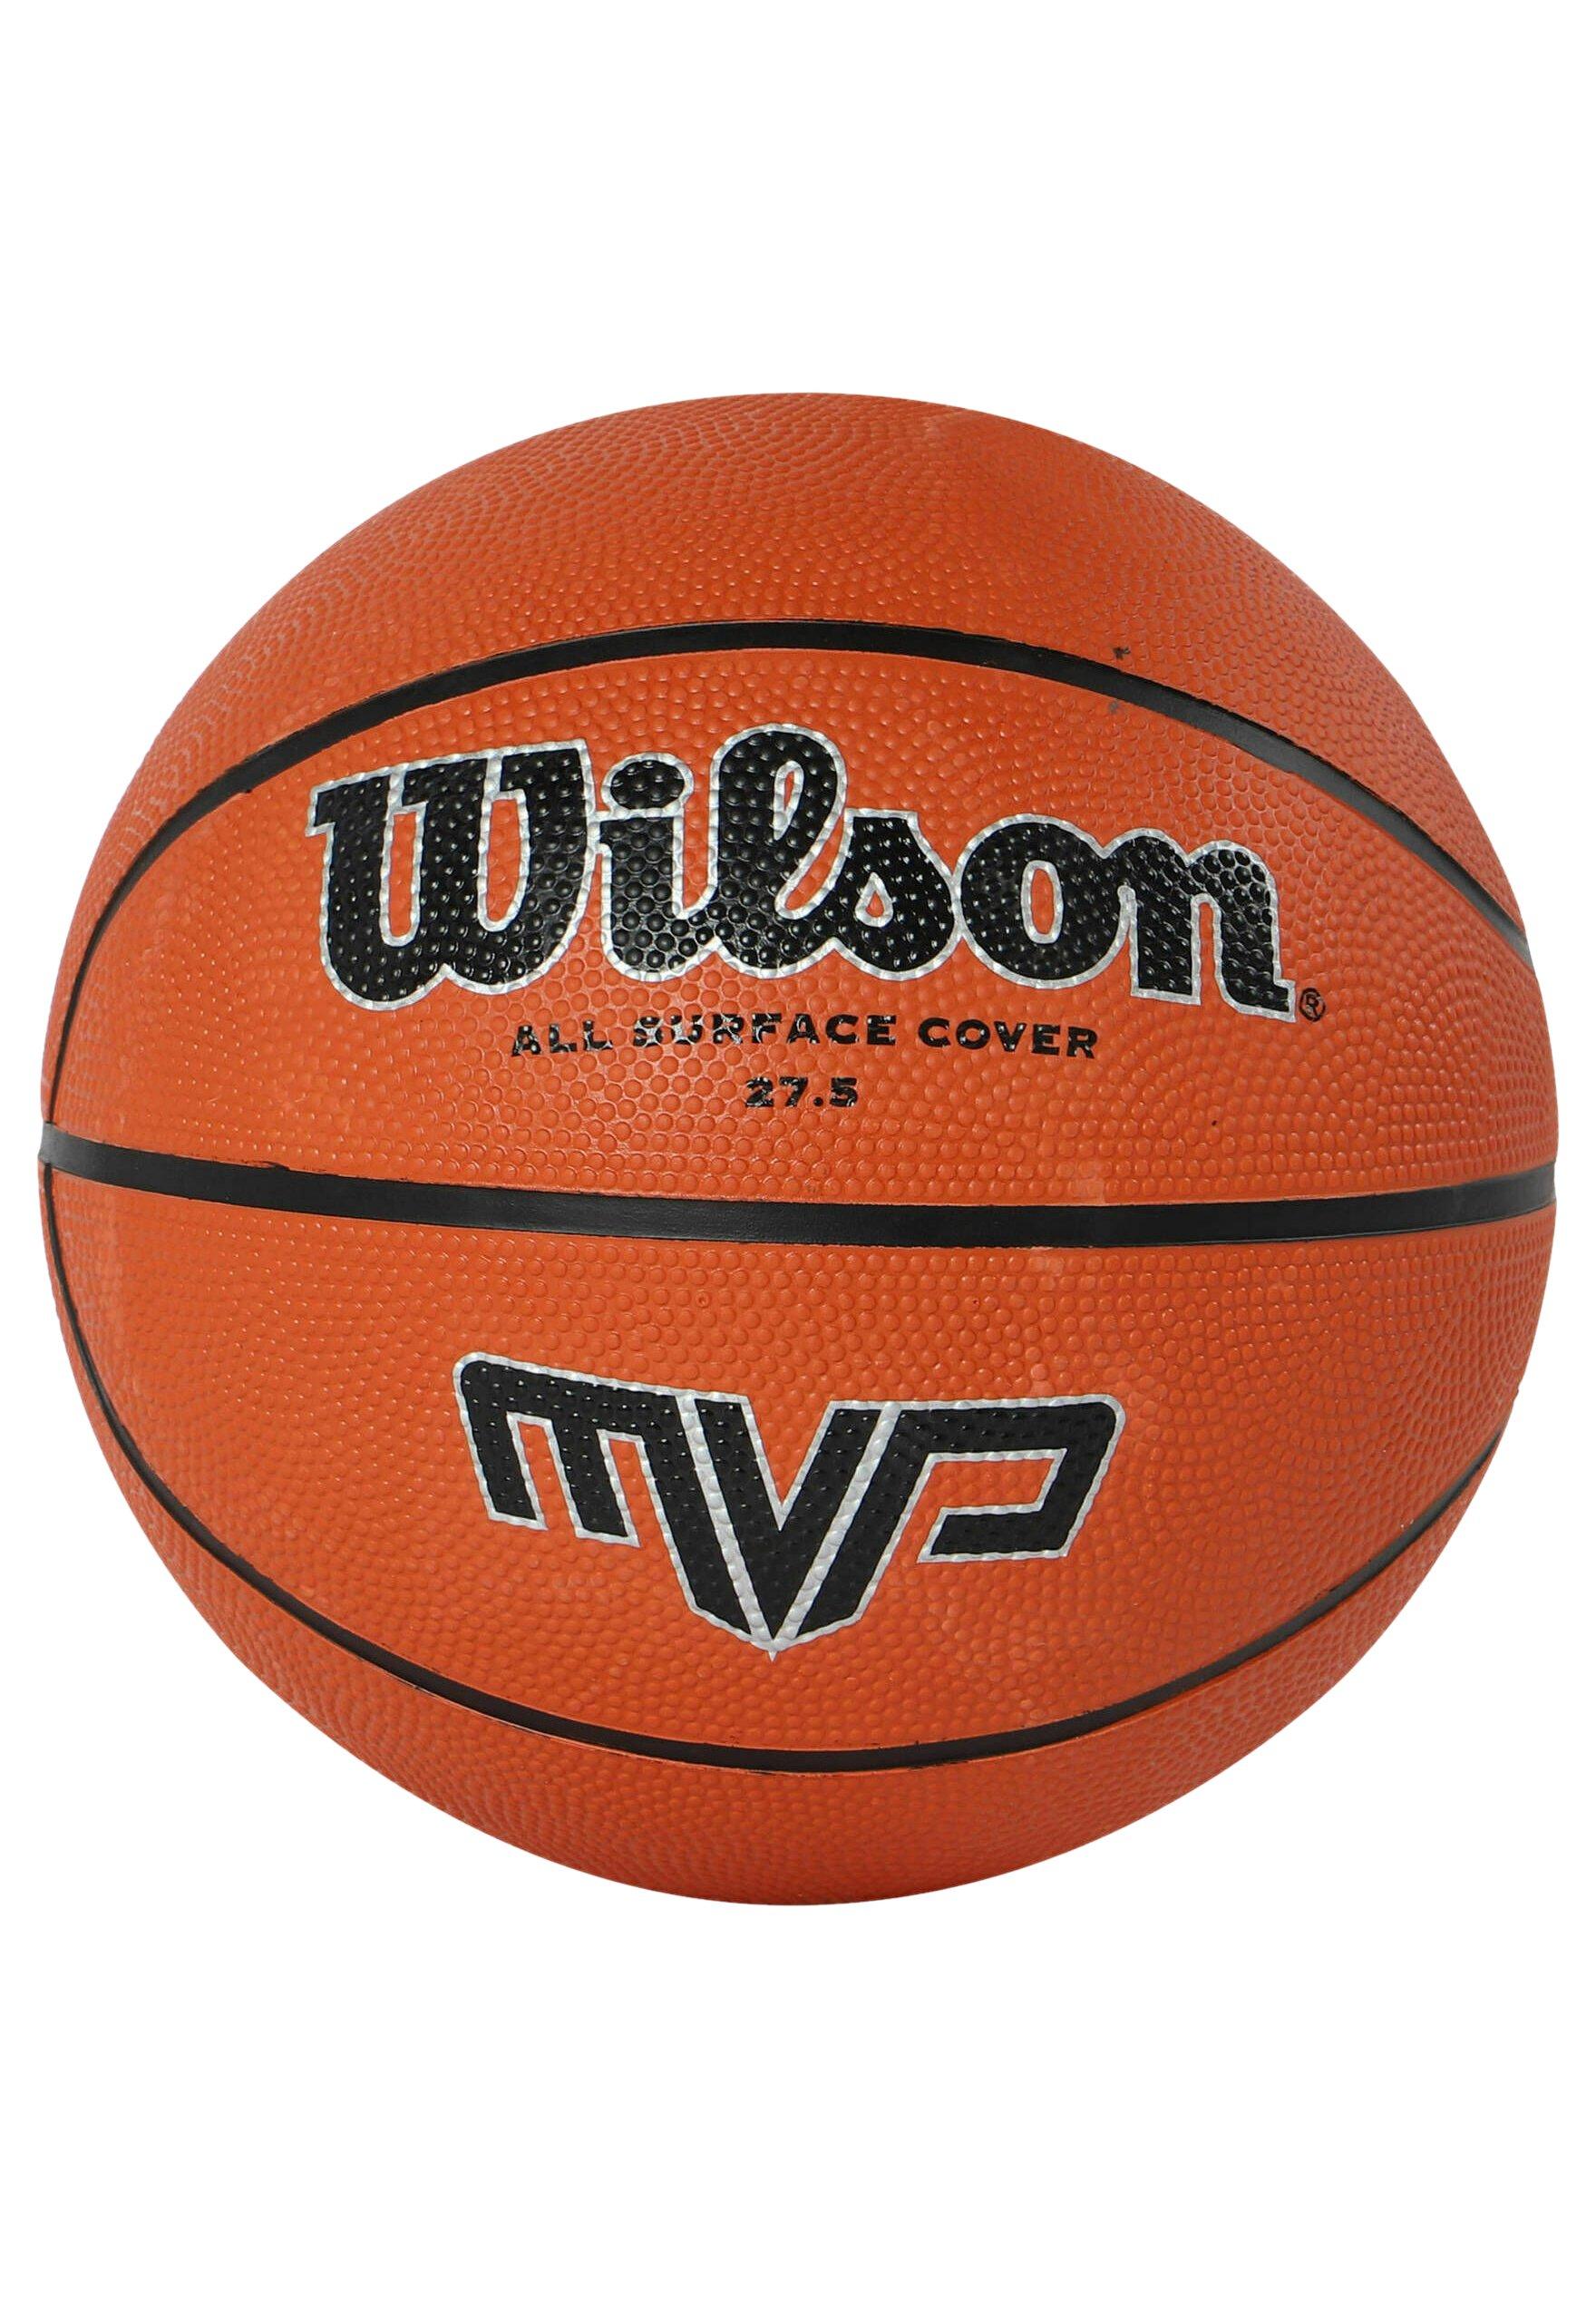 Herren Basketball - orange